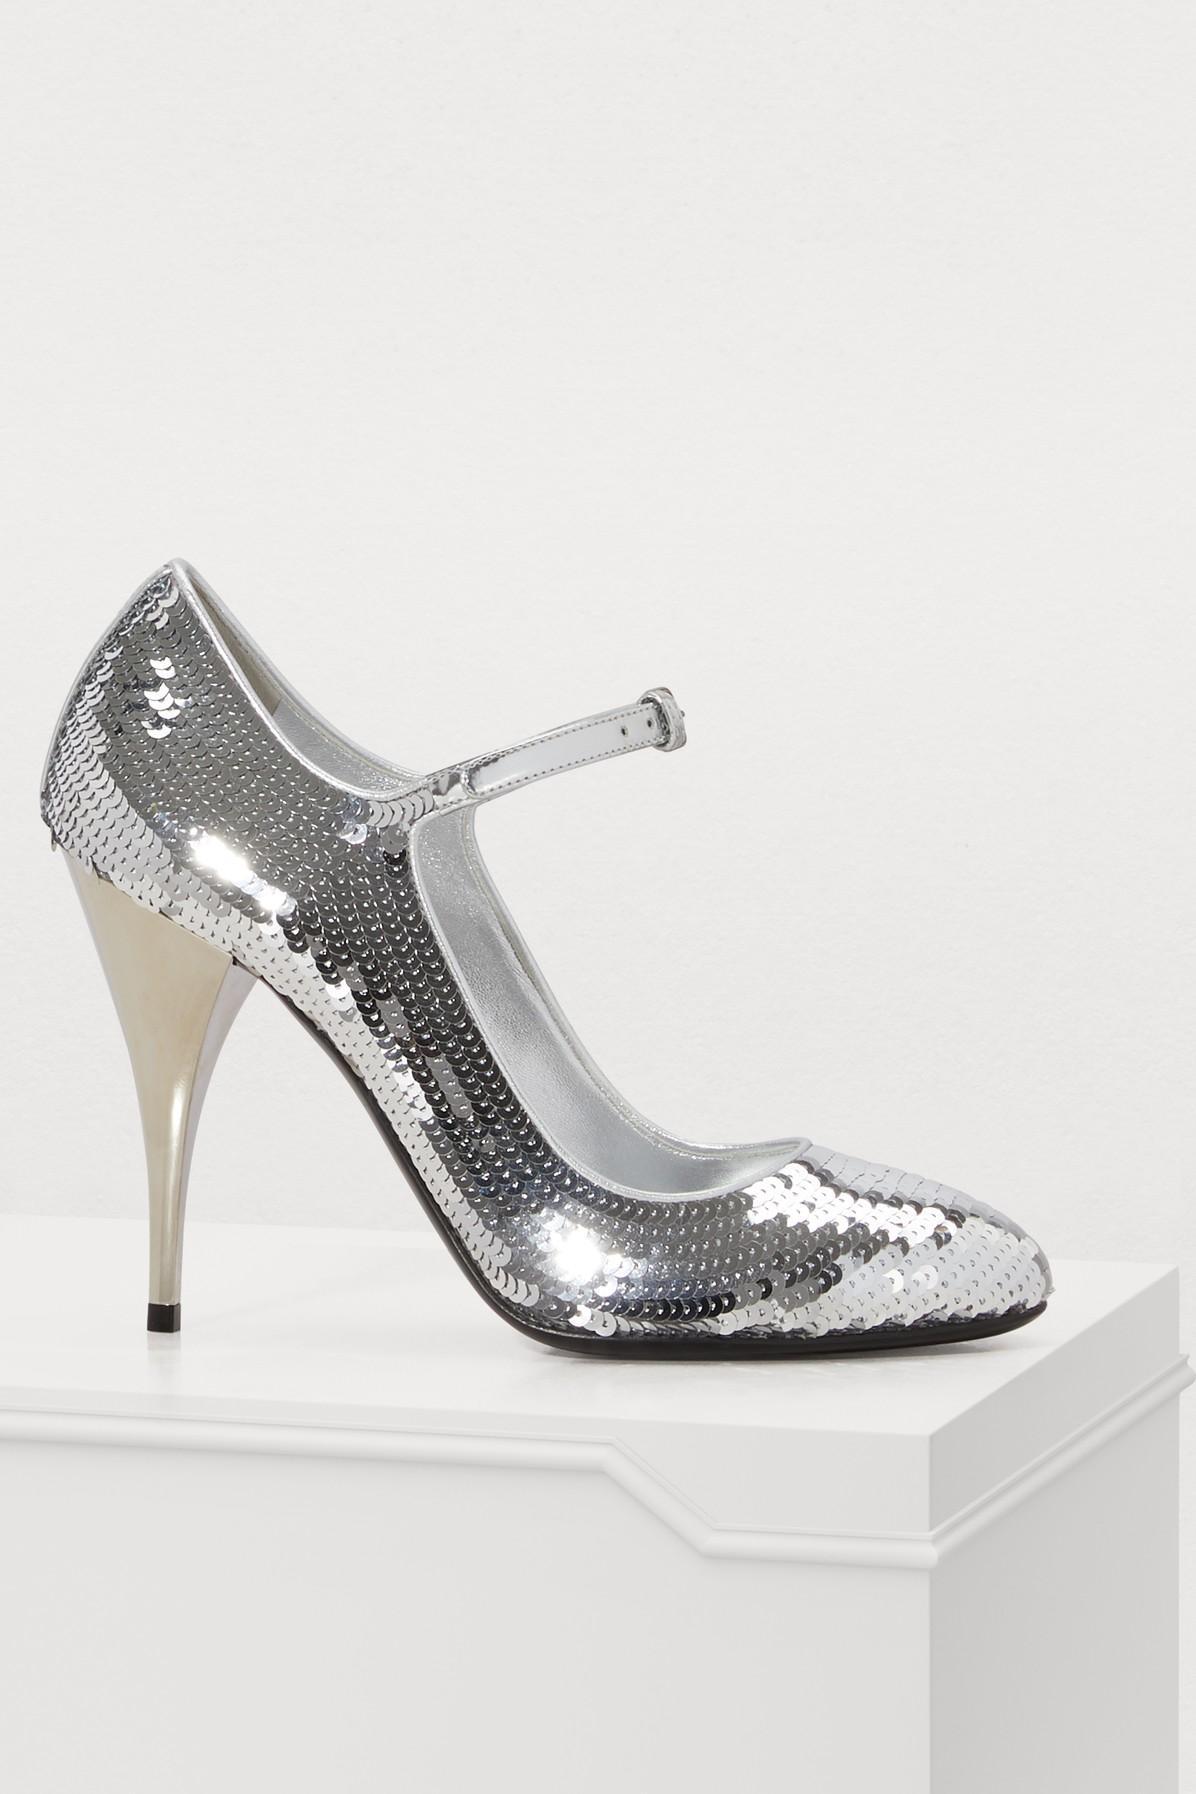 30c9ad90838 Miu Miu Mary Jane Pumps In Silver